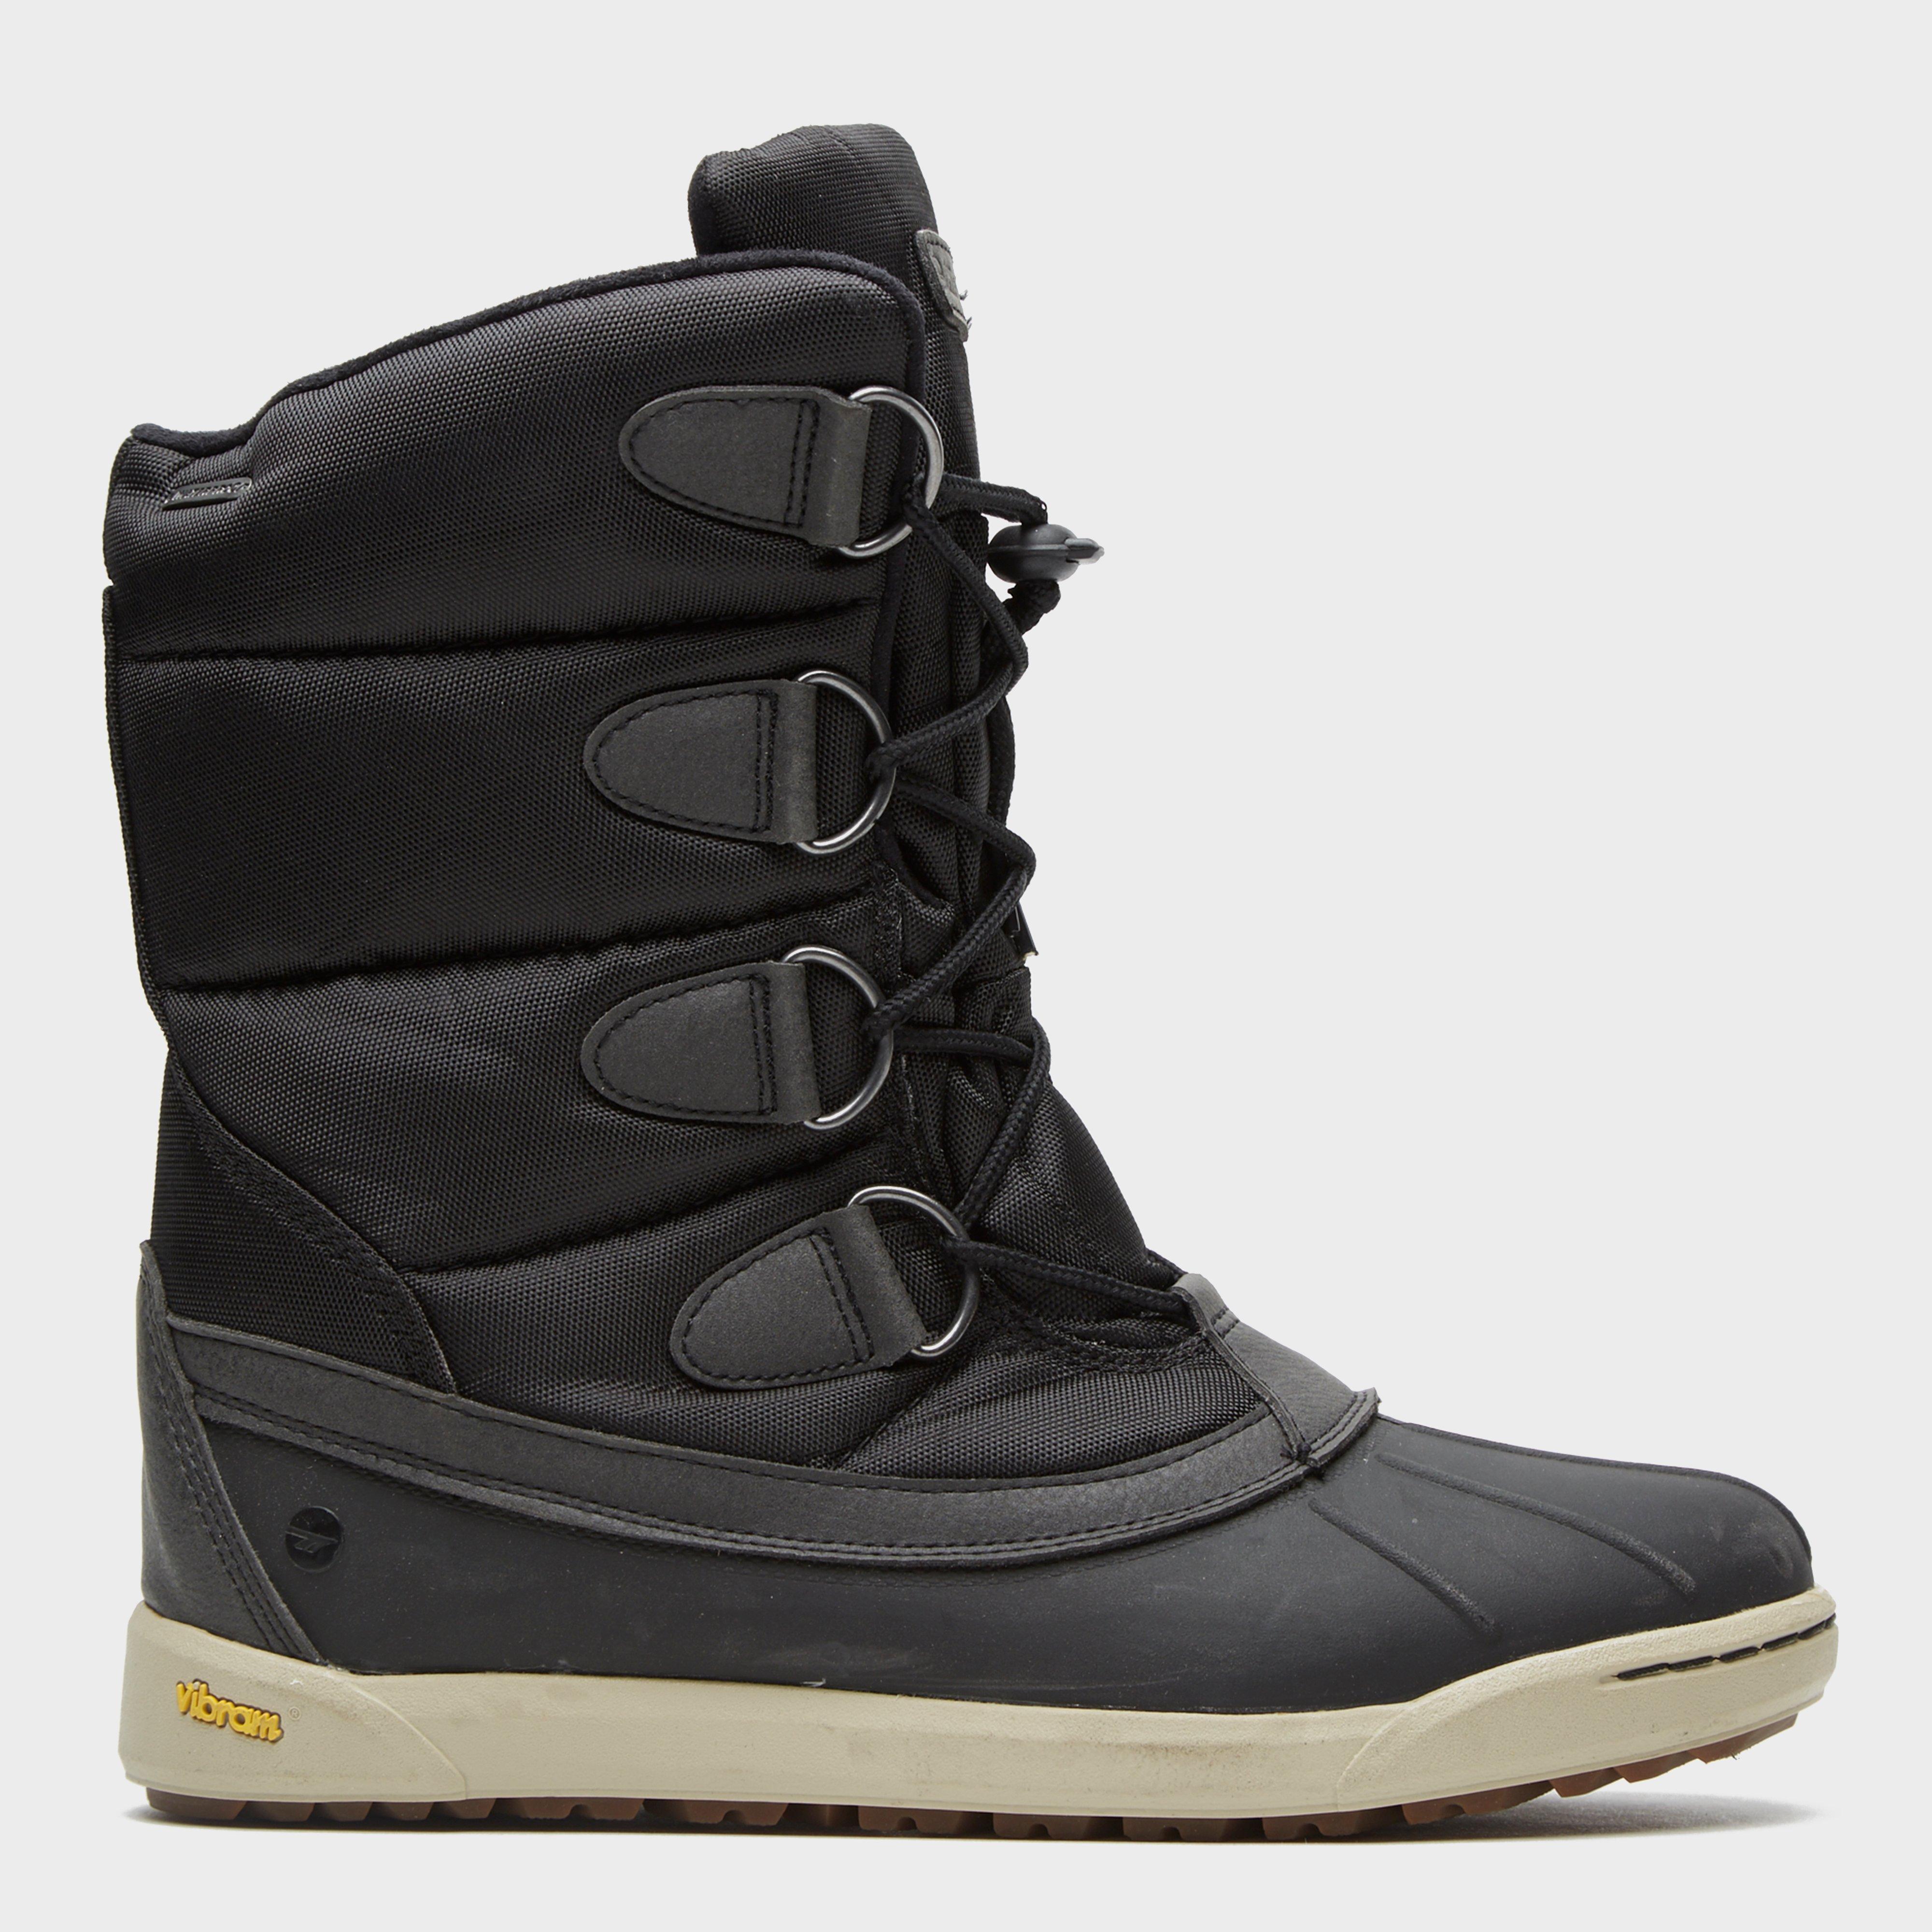 Women's Snow Boots & Winter Boots | Millets